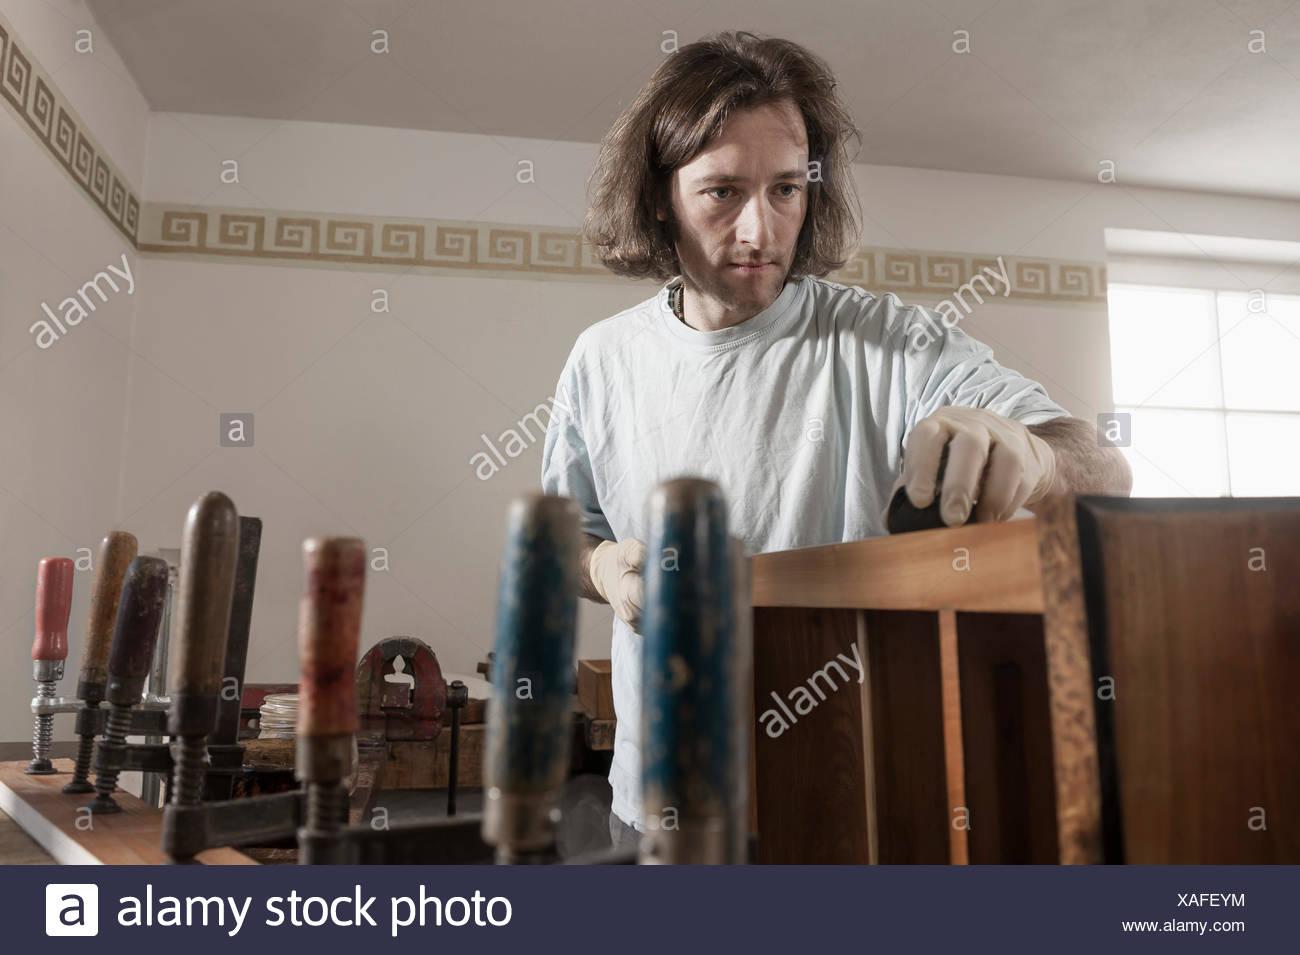 Carpenter French polishing wooden drawer at workshop, Bavaria, Germany Stock Photo